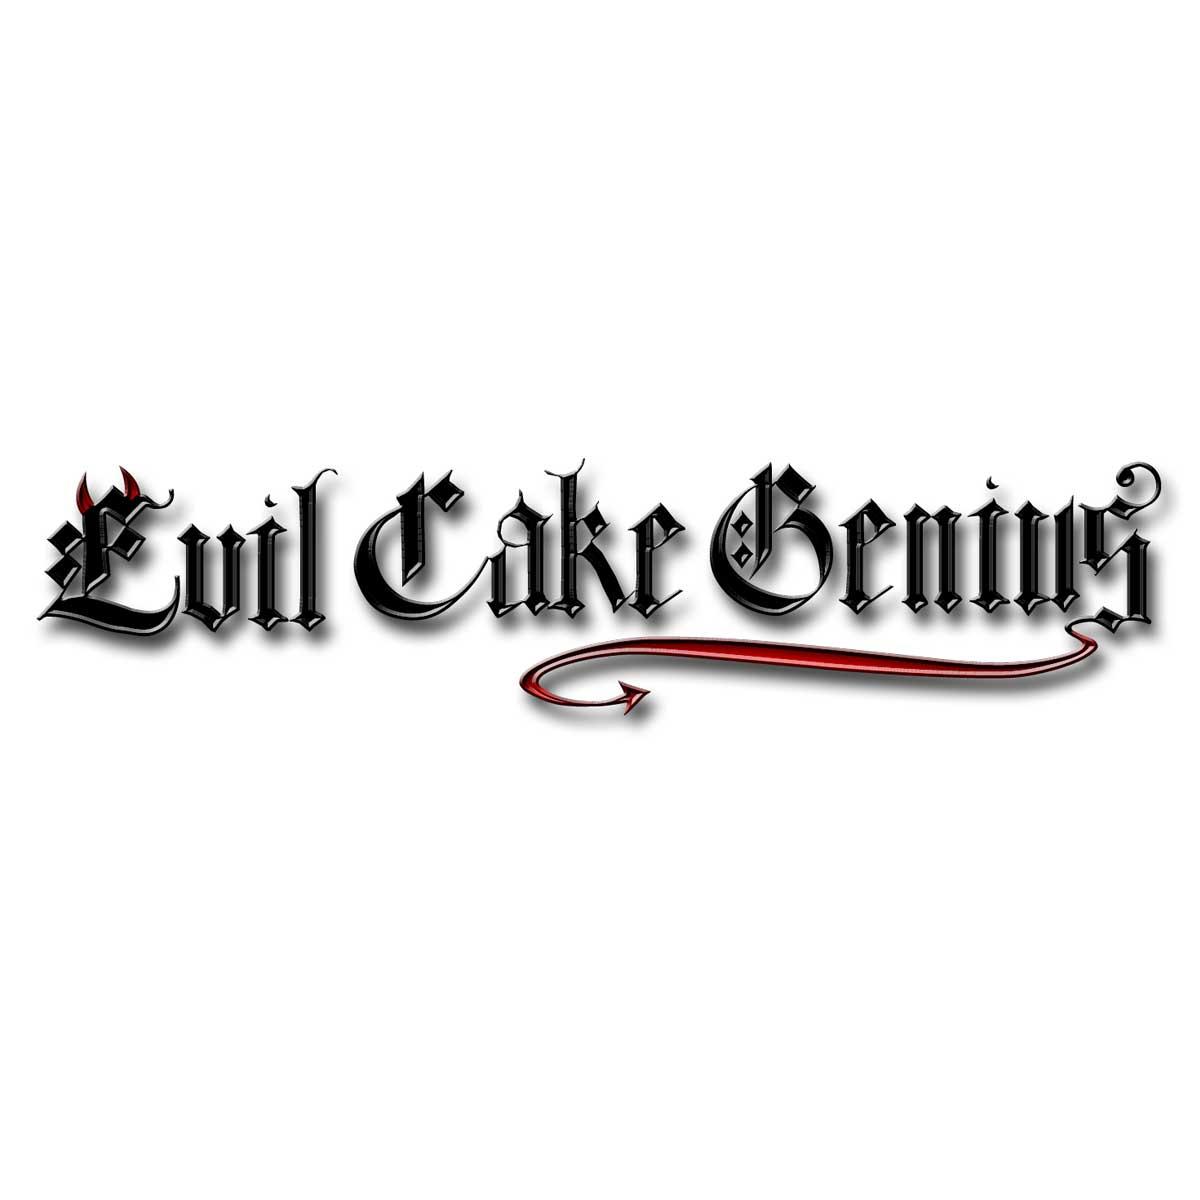 Sprinkles Sequins Gold Evil Cake Genius